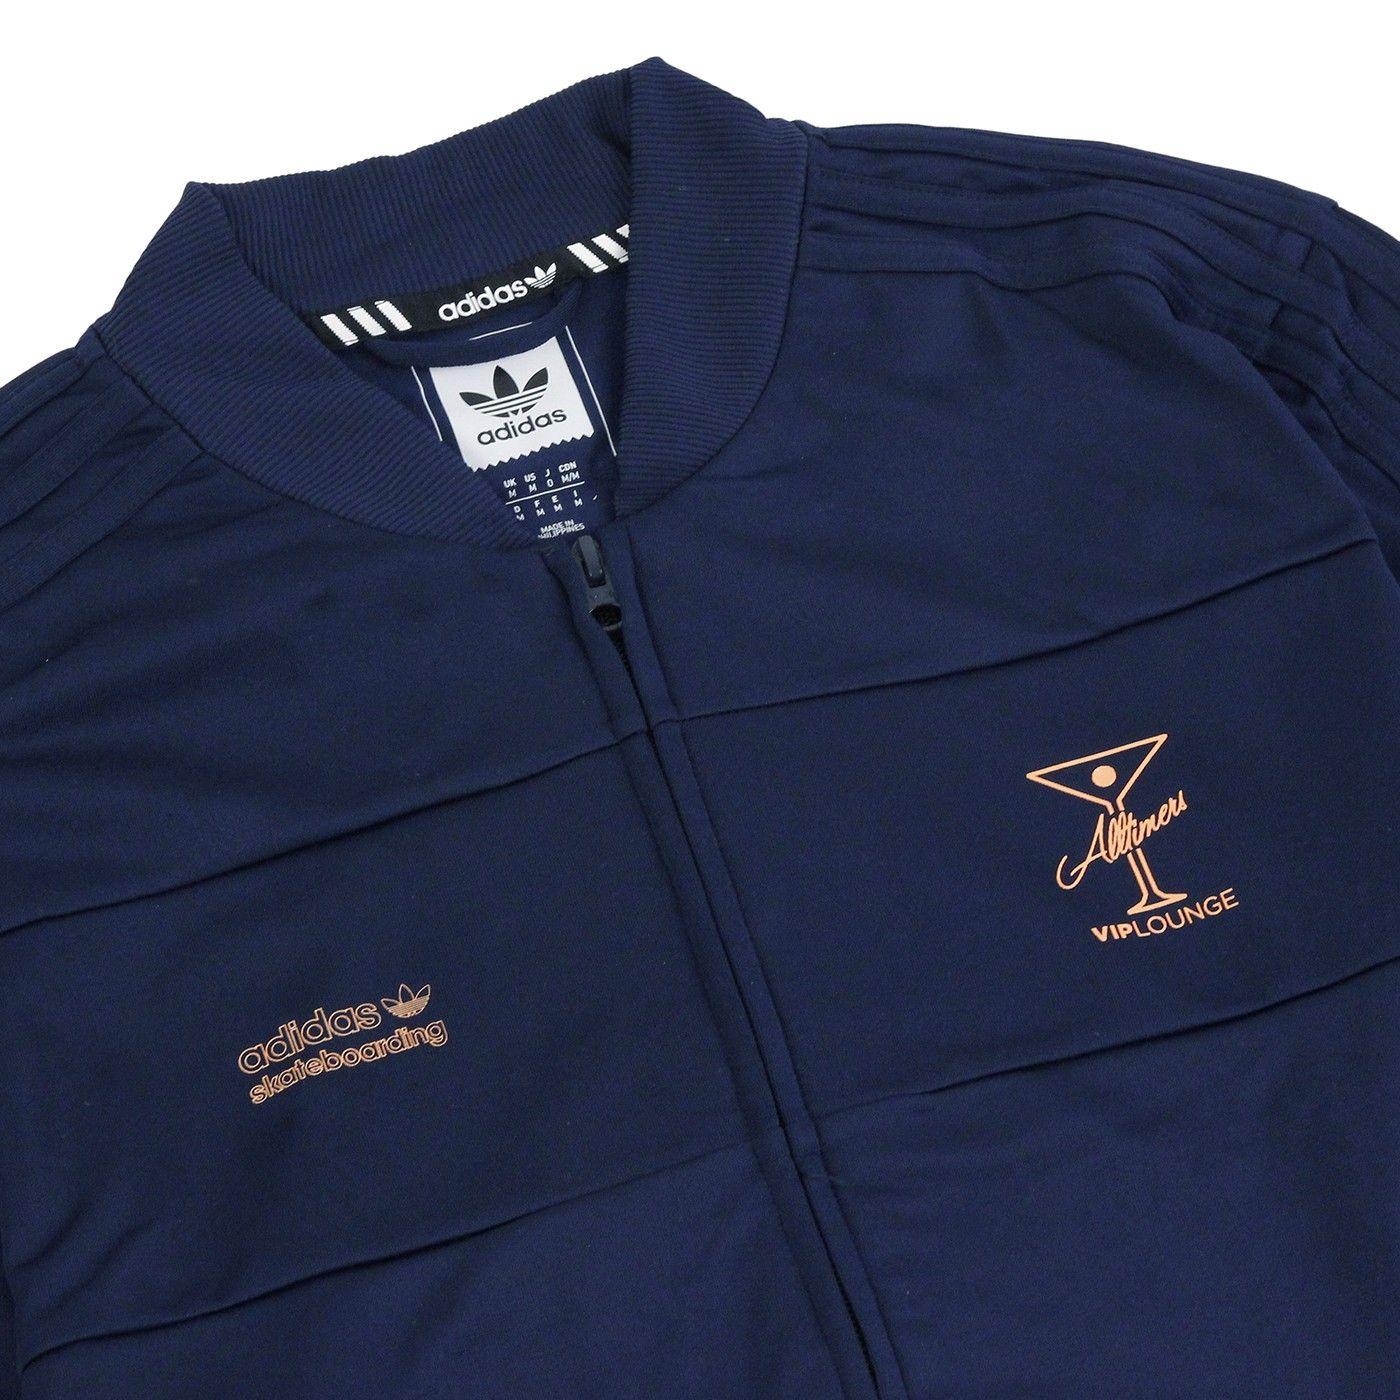 50e4de17 Track Jacket in Collegiate Navy by Adidas Skateboarding x Alltimers ...